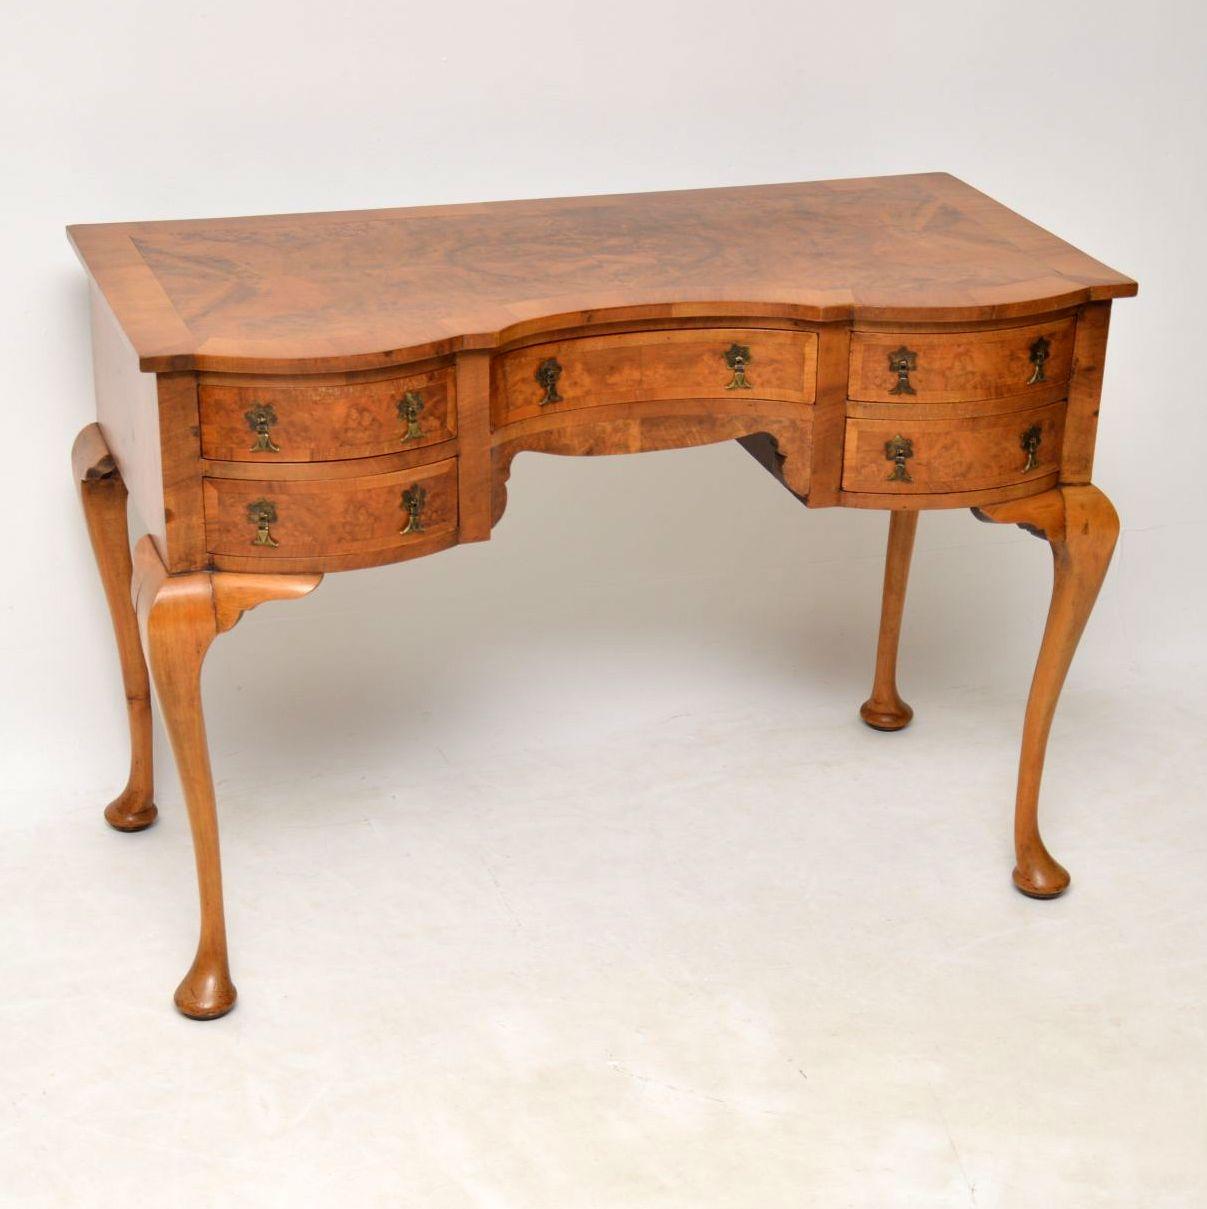 Antique Burr Walnut Desk / Dressing Table